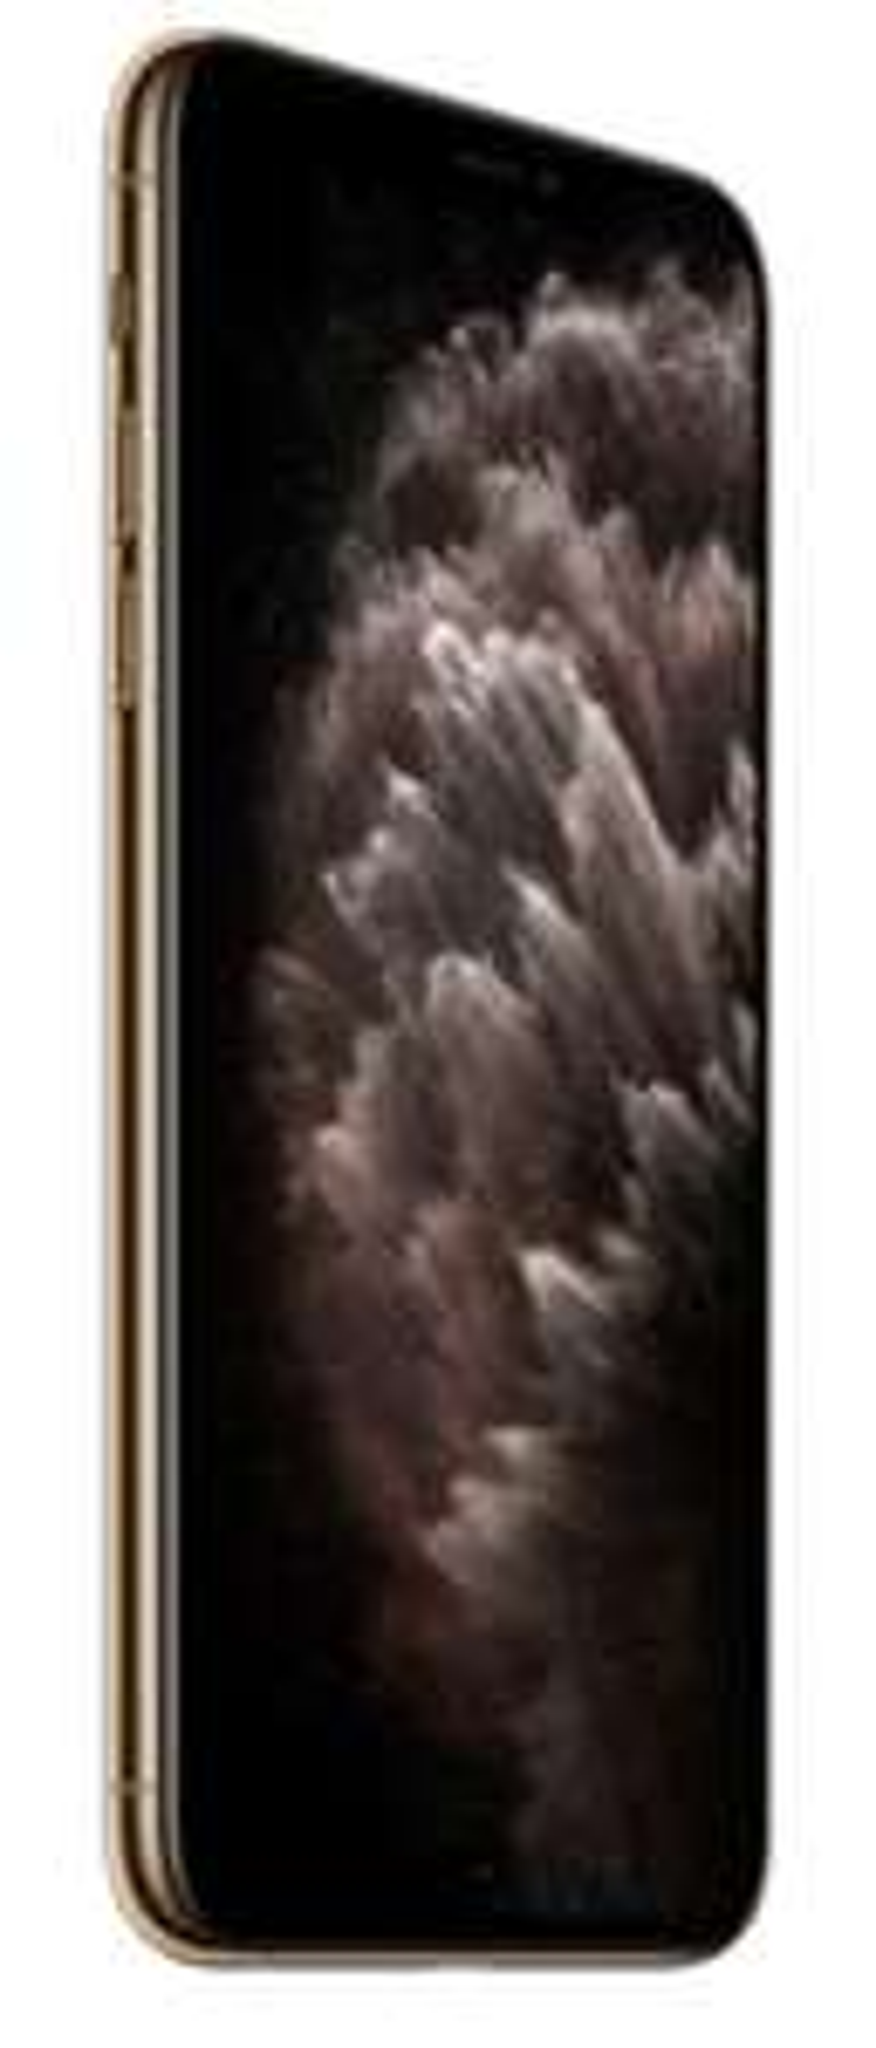 APPLE iPhone 11 Pro Max - 64 GB, Gold - £599.97 (2% via TopCashback) @ Currys PC World